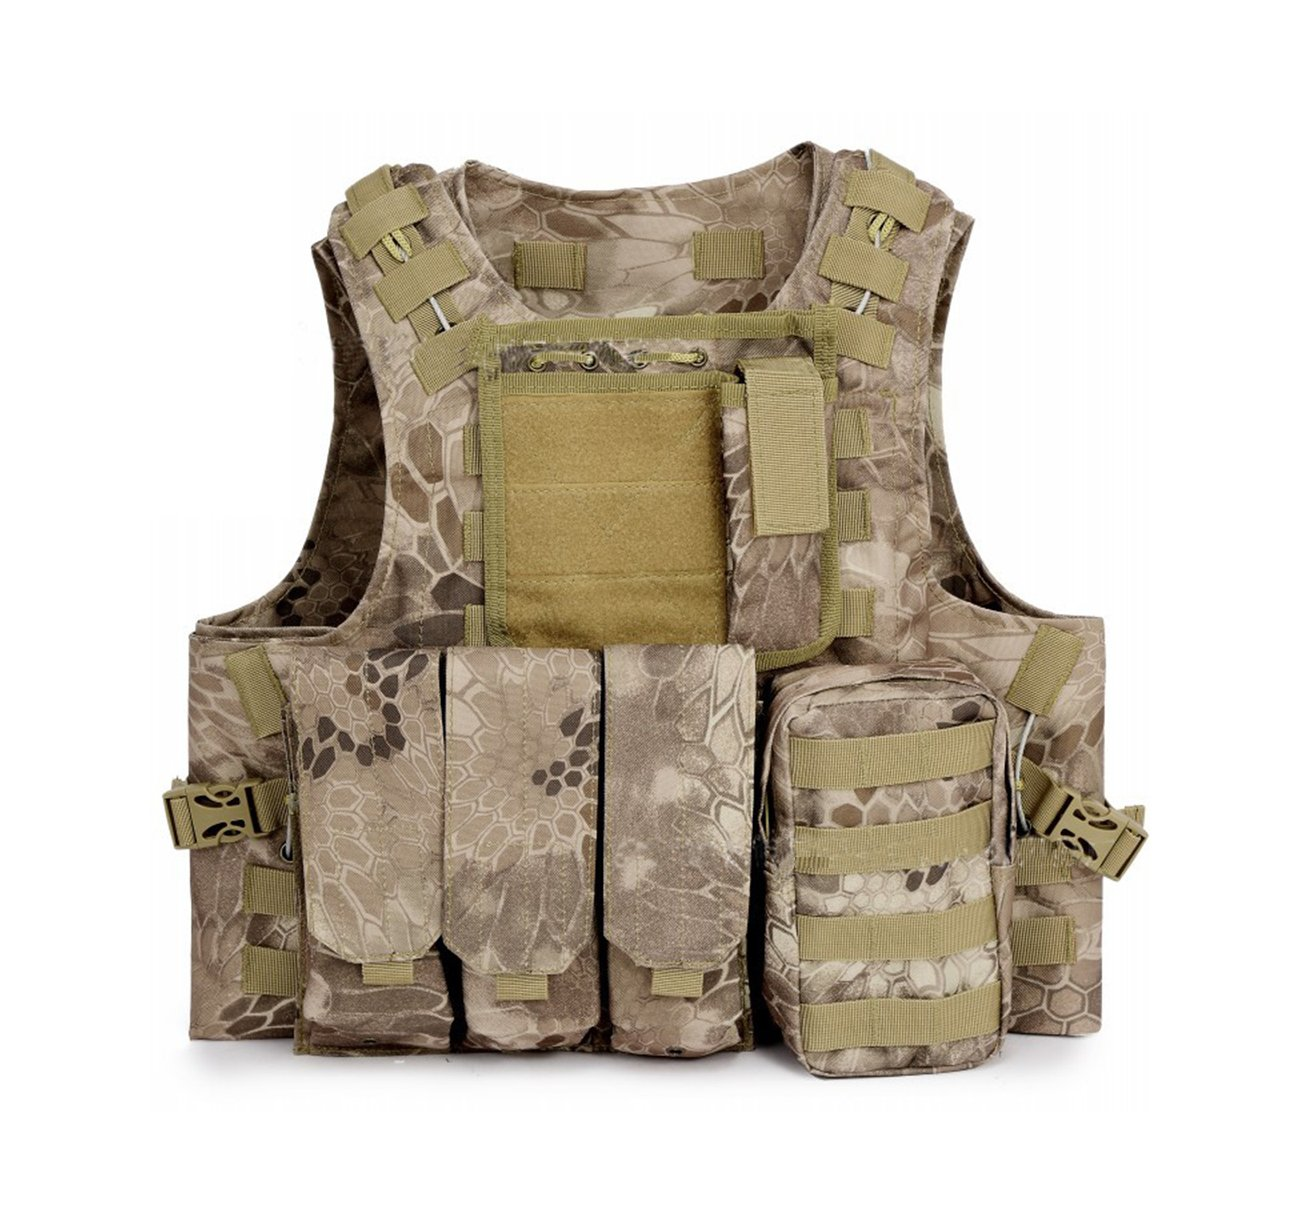 ESA Supplies Tactical Molle Airsoft Vest Paintball Combat Training Vest Soft Vest Tan Python Pattern by ESA Supplies